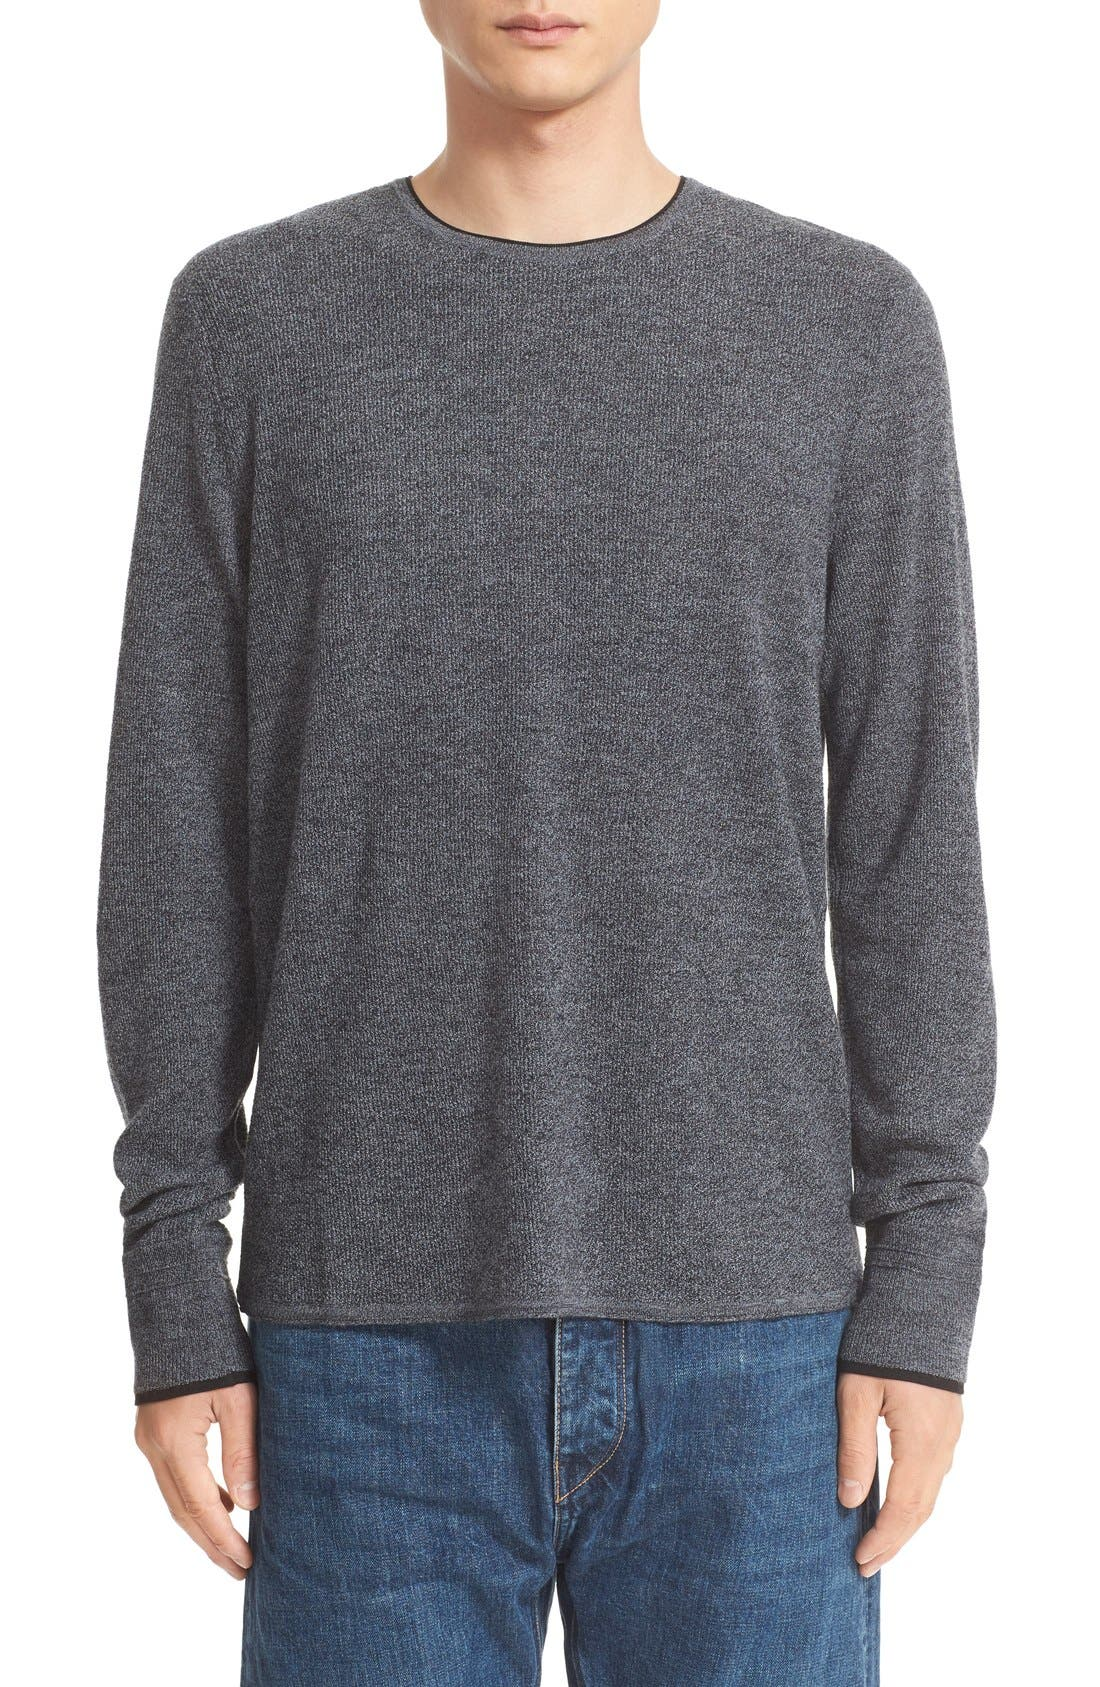 Main Image - rag & bone 'Giles' Lightweight Merino Wool Pullover